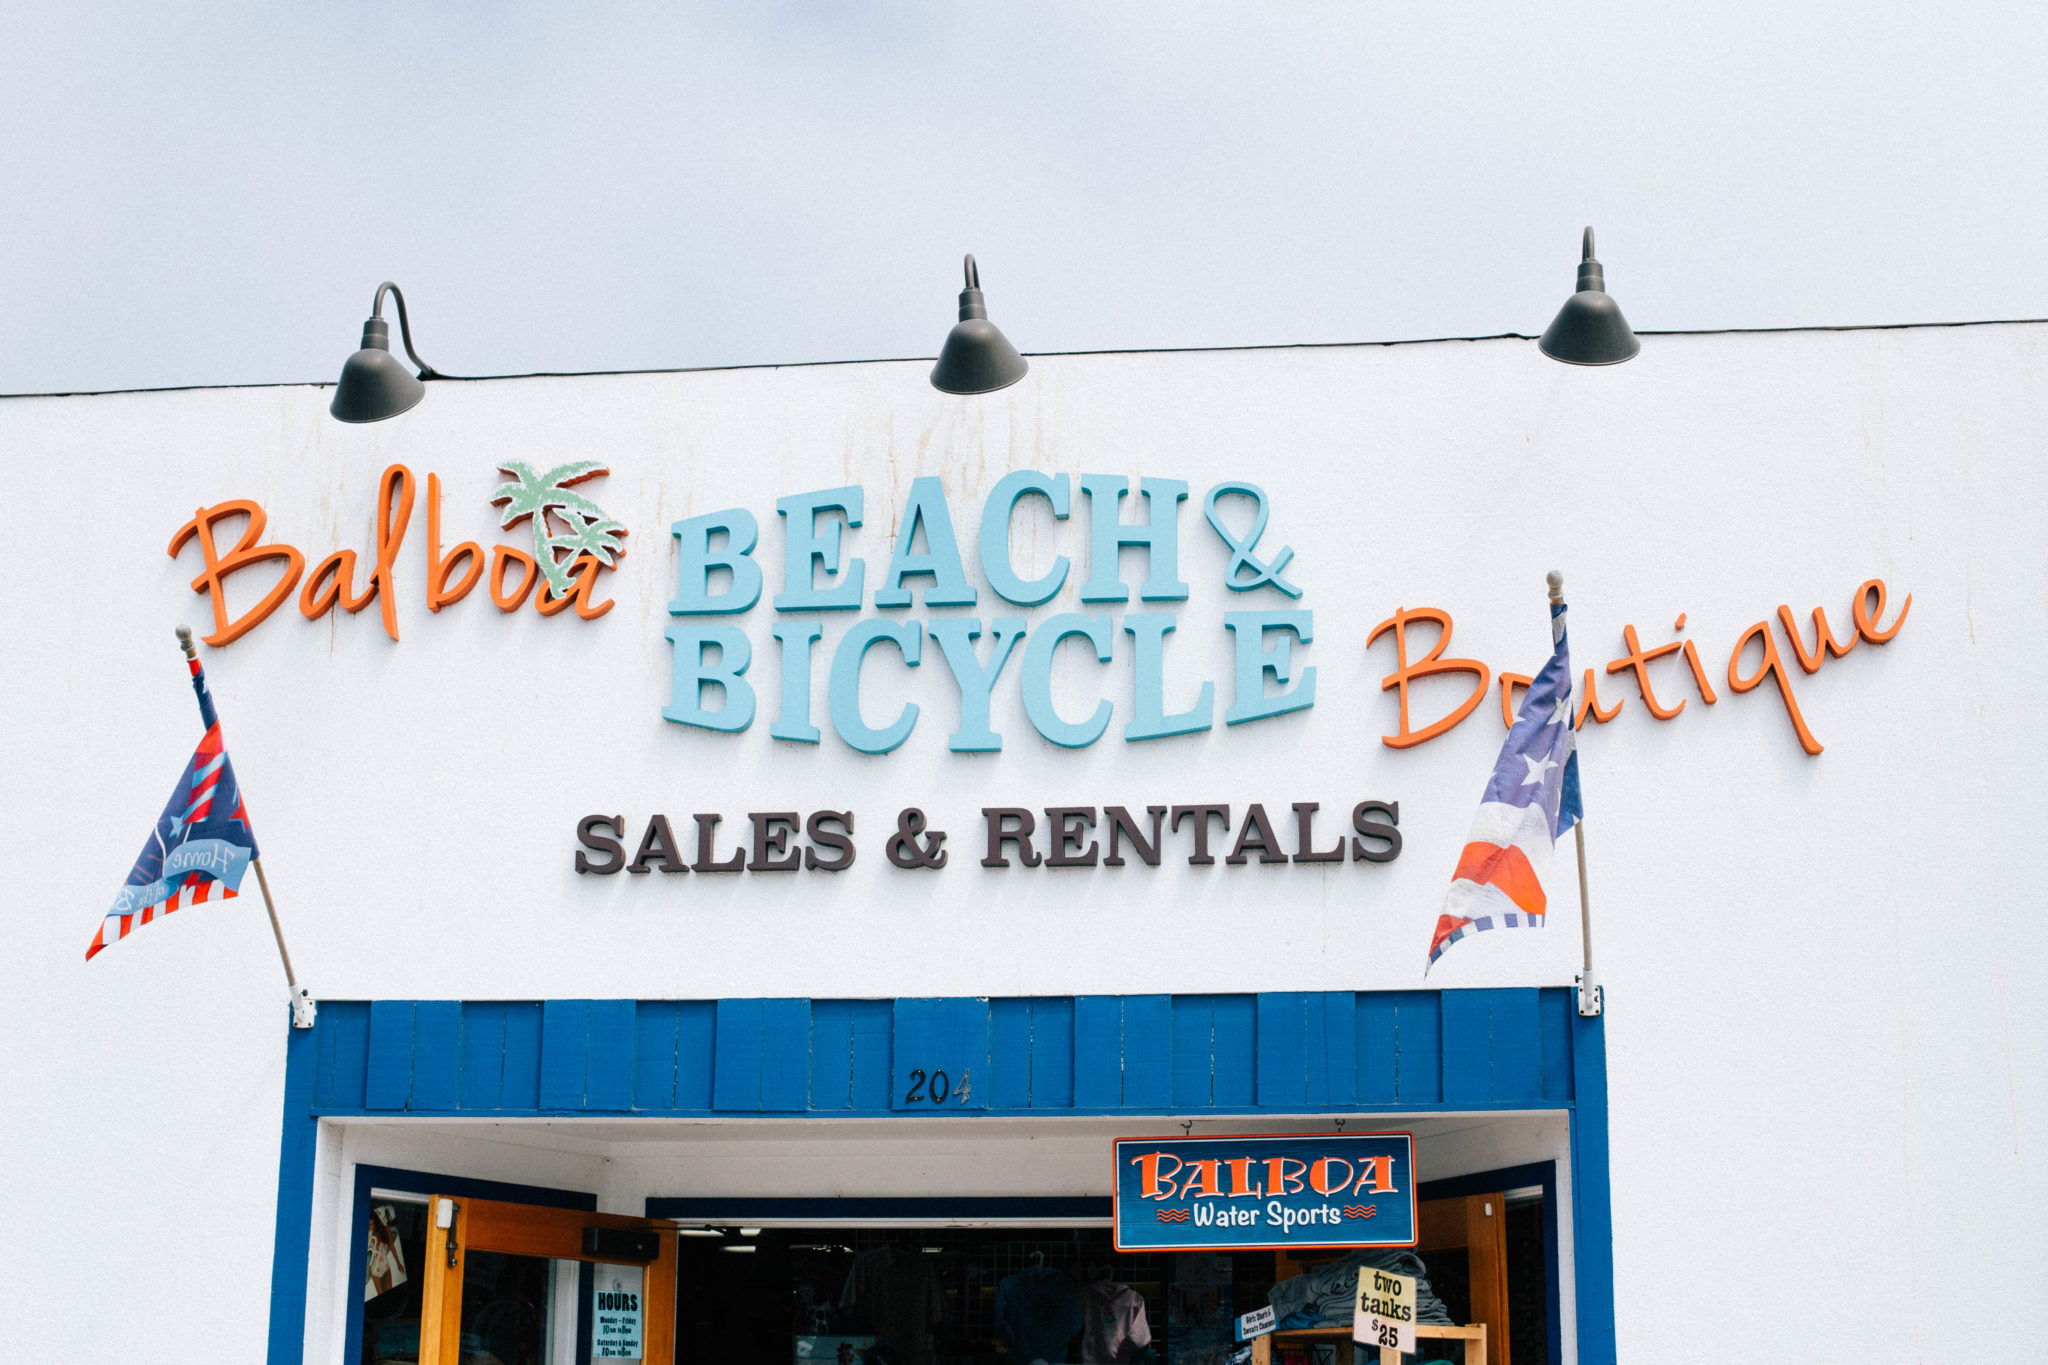 Balboa Beach & Bicycle Boutique